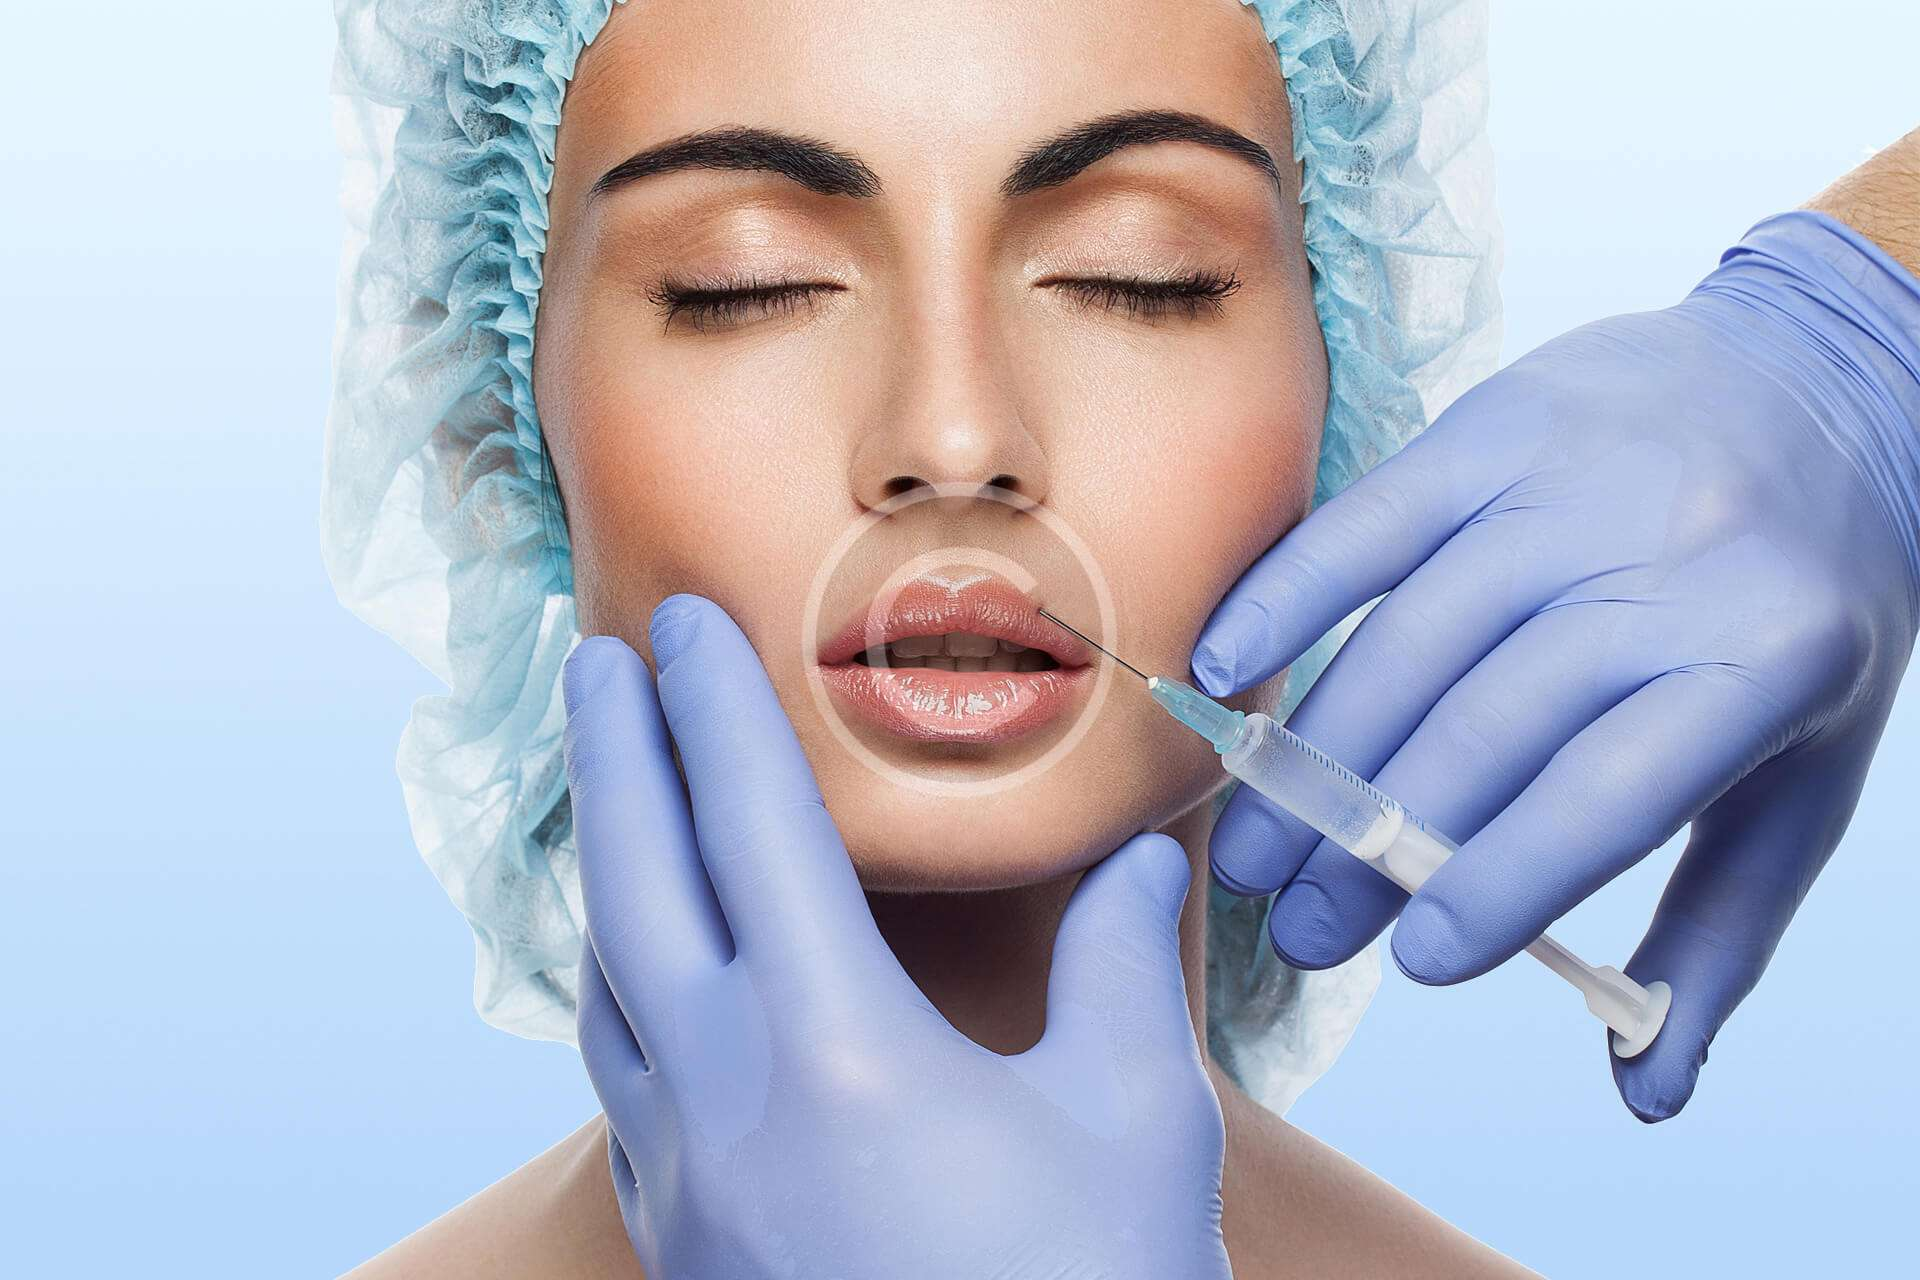 Estetski tretmani Botoxom